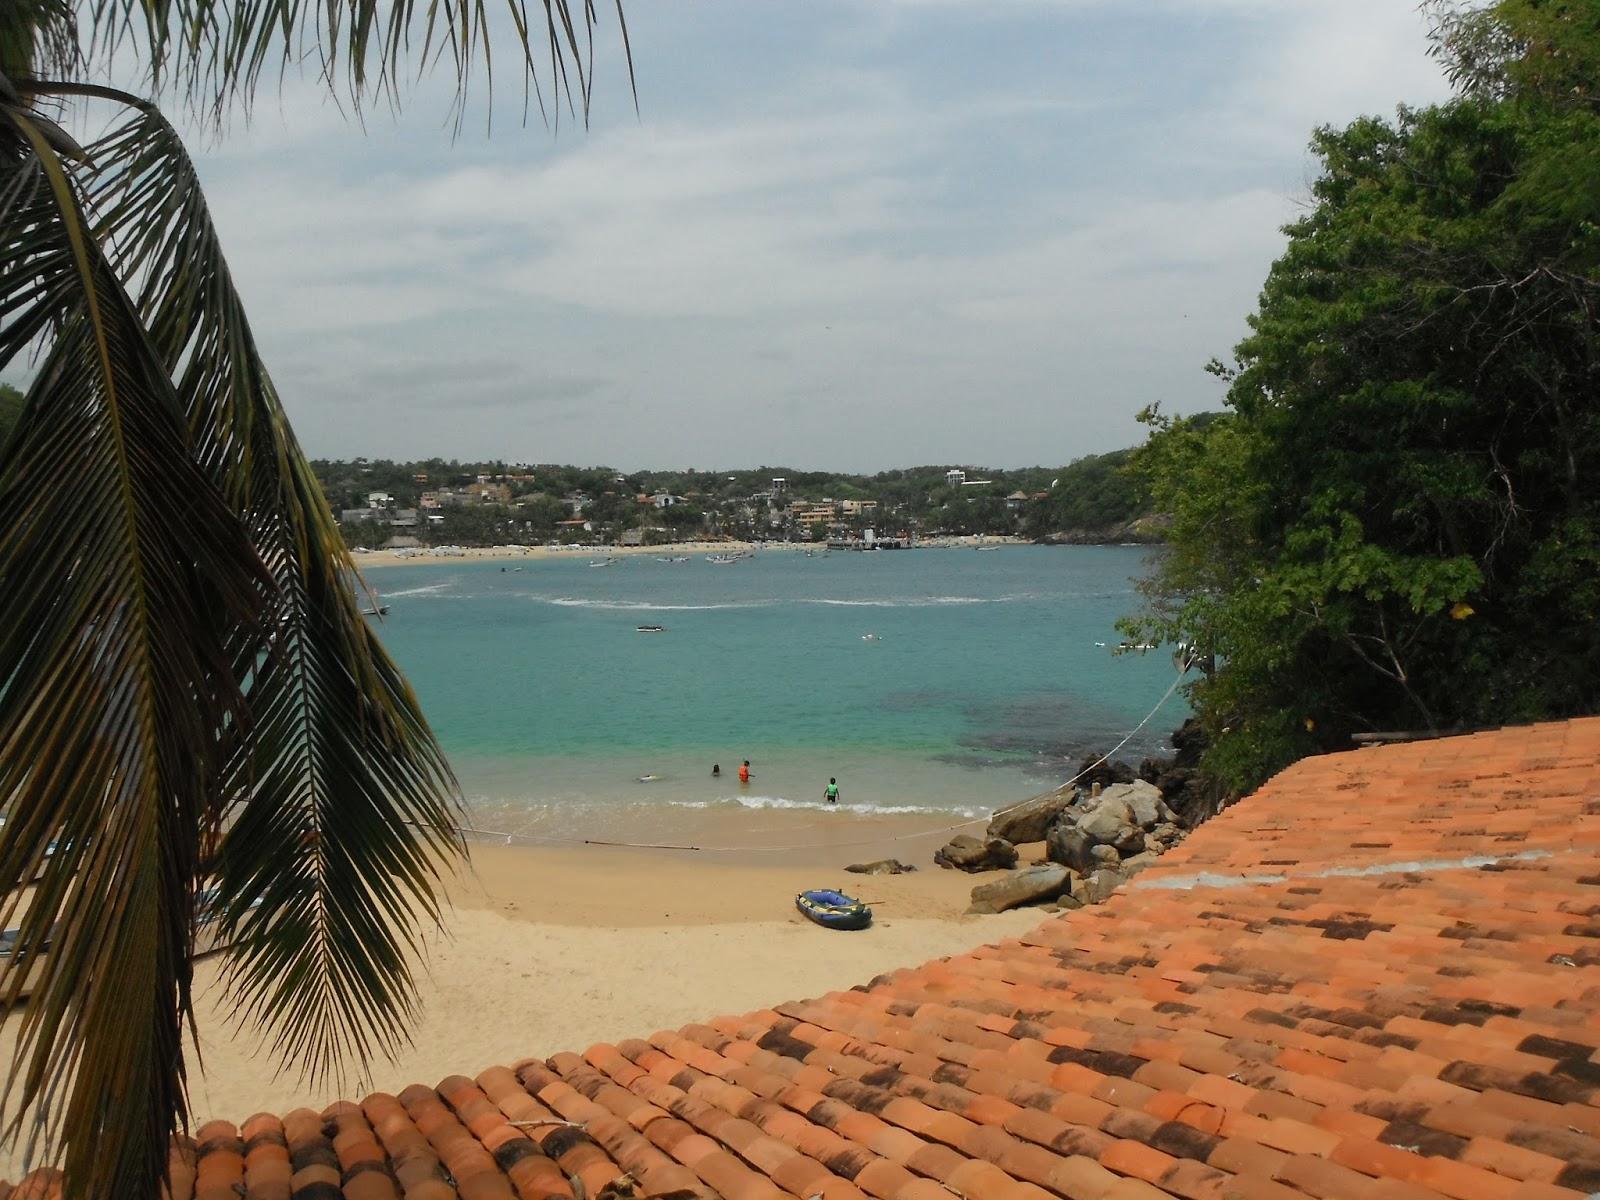 Ecoturismo m xico playa pante n puerto angel oaxaca for En zacatecas hay playa